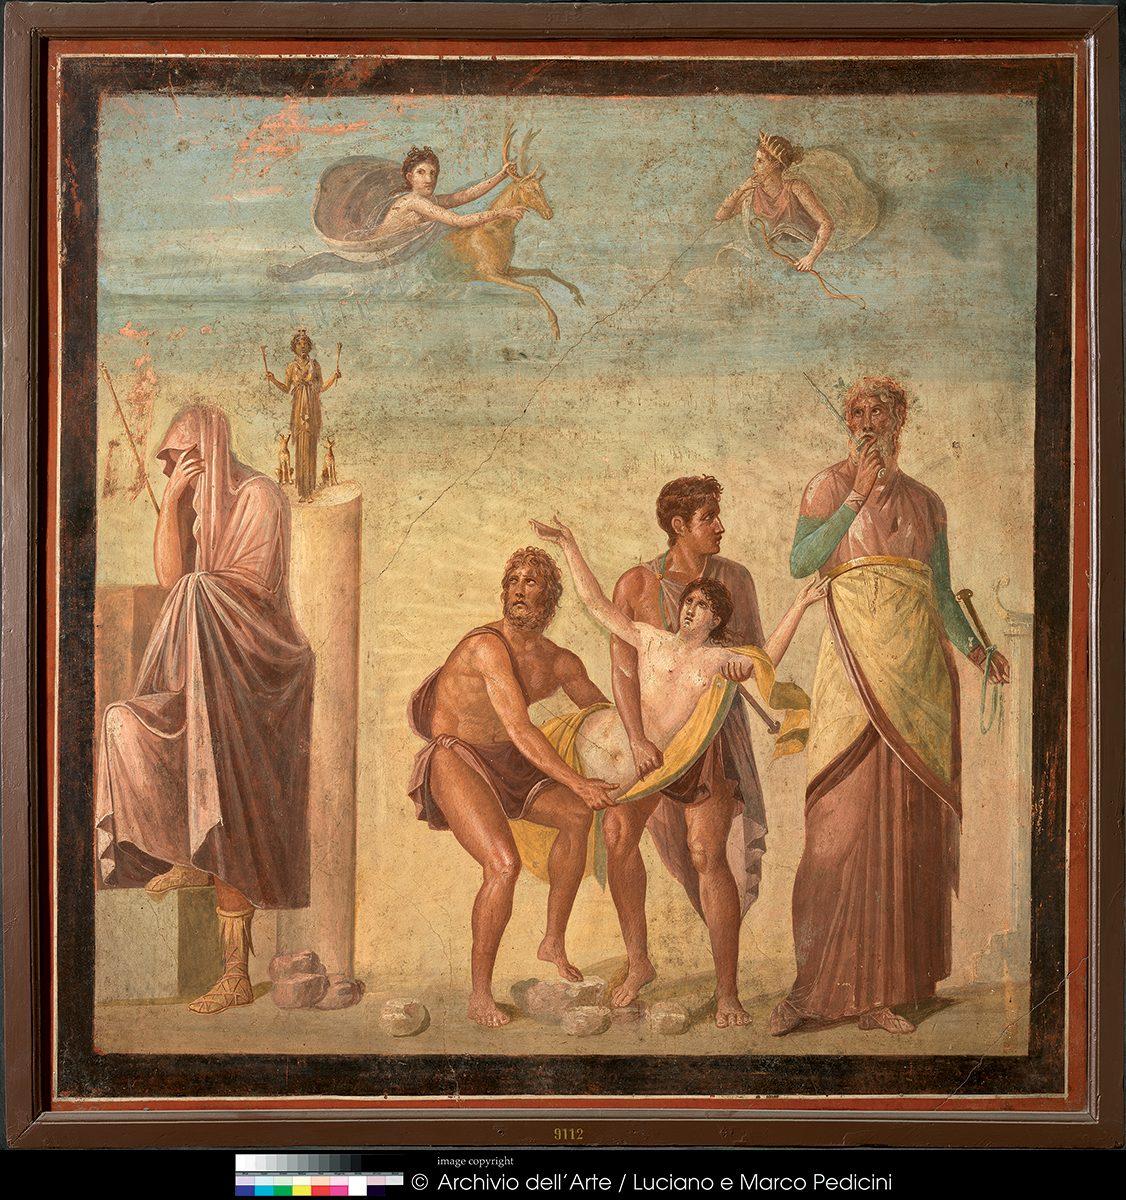 Wall Painting with Scene from the Sacrifice of Iphigeneia ca. 62-79 AD. Fresco on Plaster. Pompeii, Casa del Poeta Tragico. Museo Archeologico Nazionale di Napoli